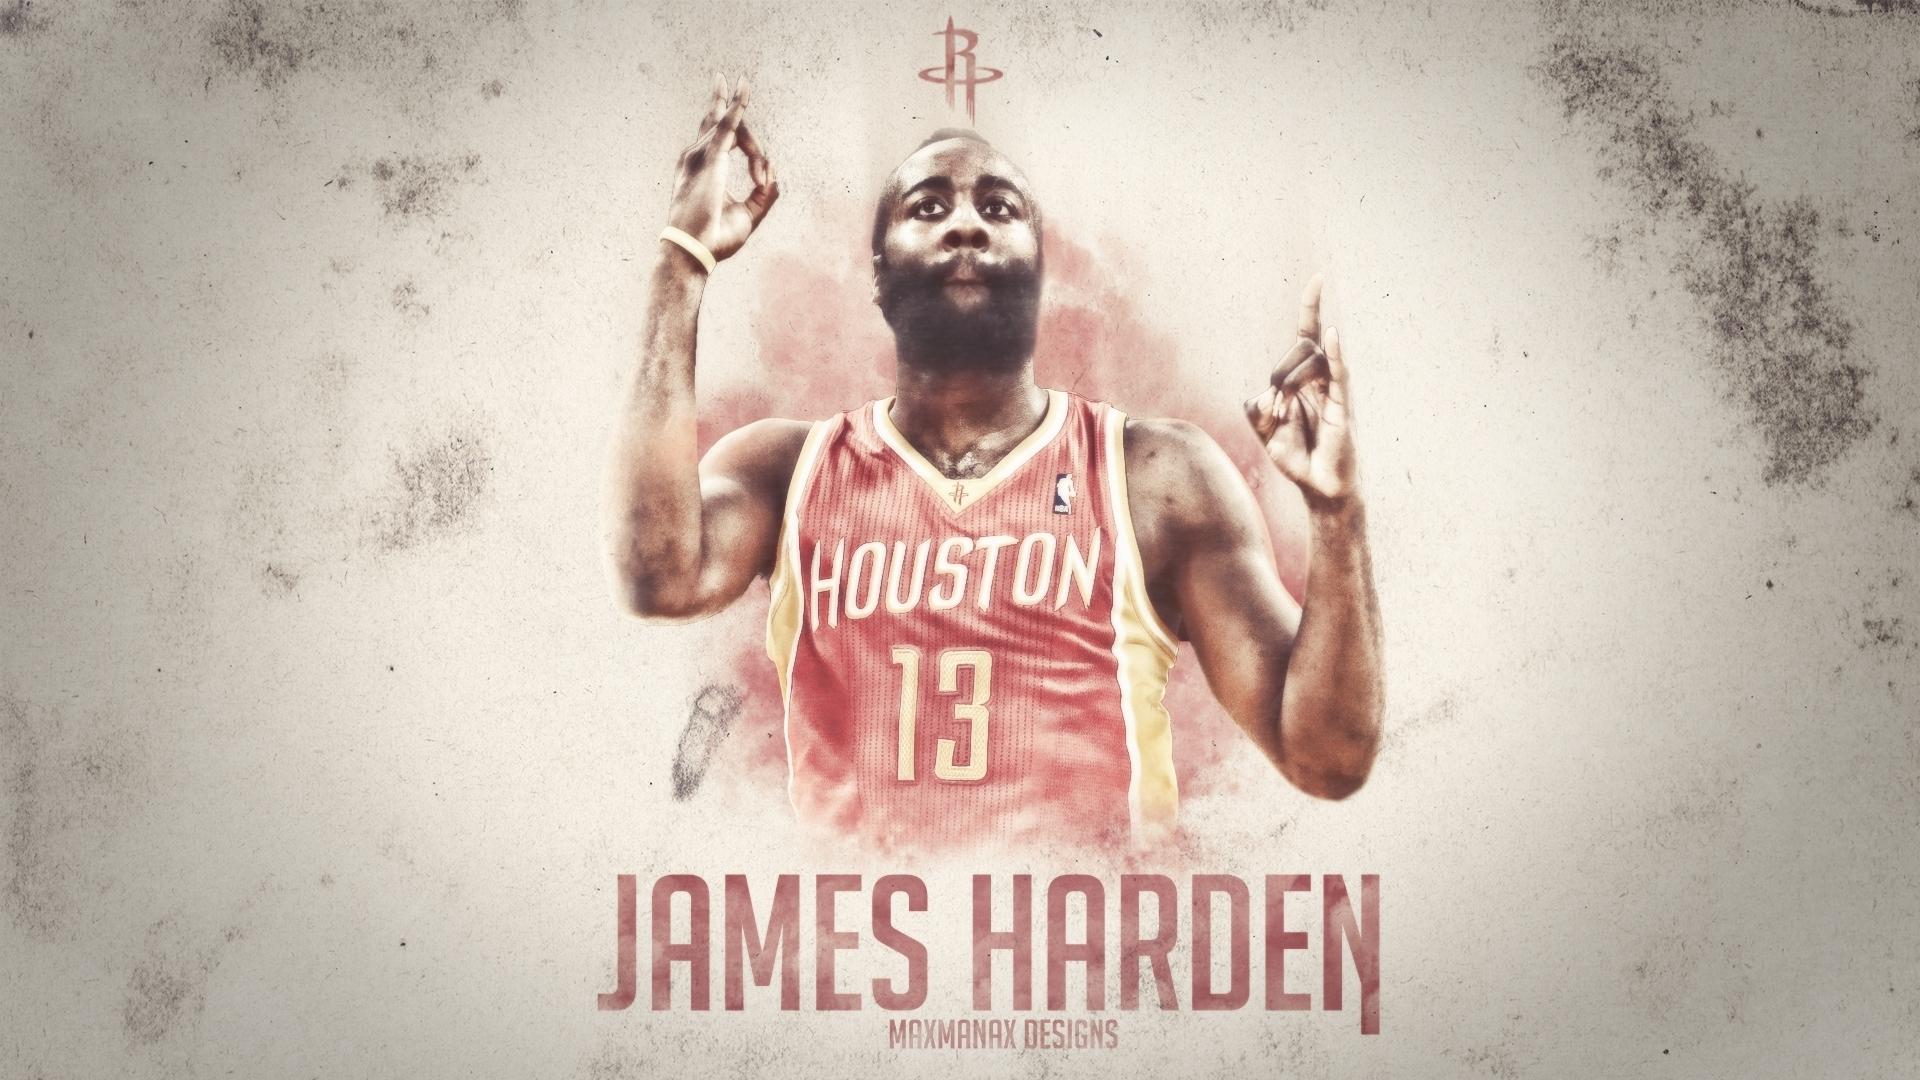 best james harden 1080p hd background wallpapers downloads